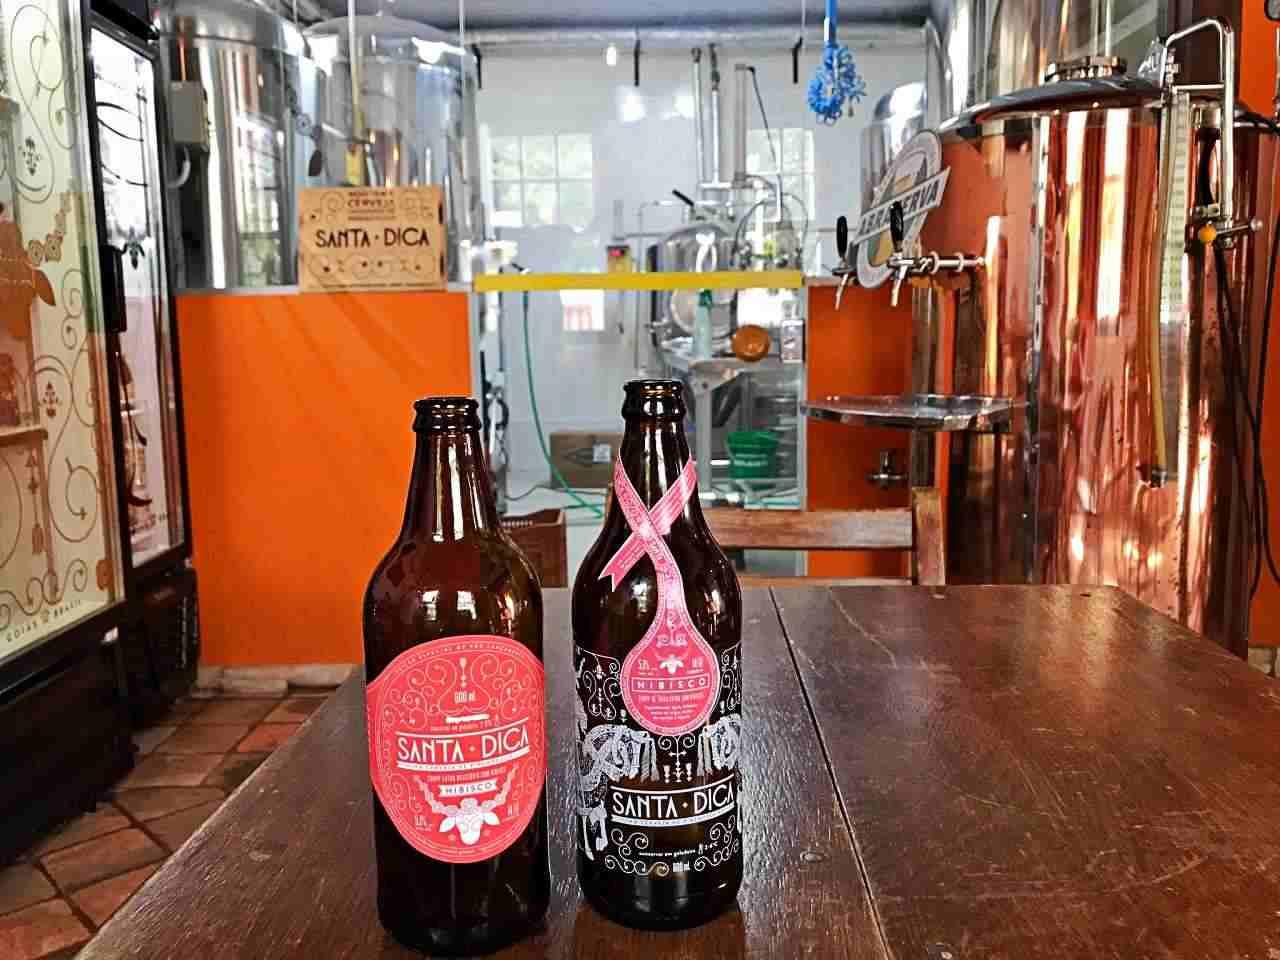 Santa Dica Cervejaria Artesanal - Pirenópolis